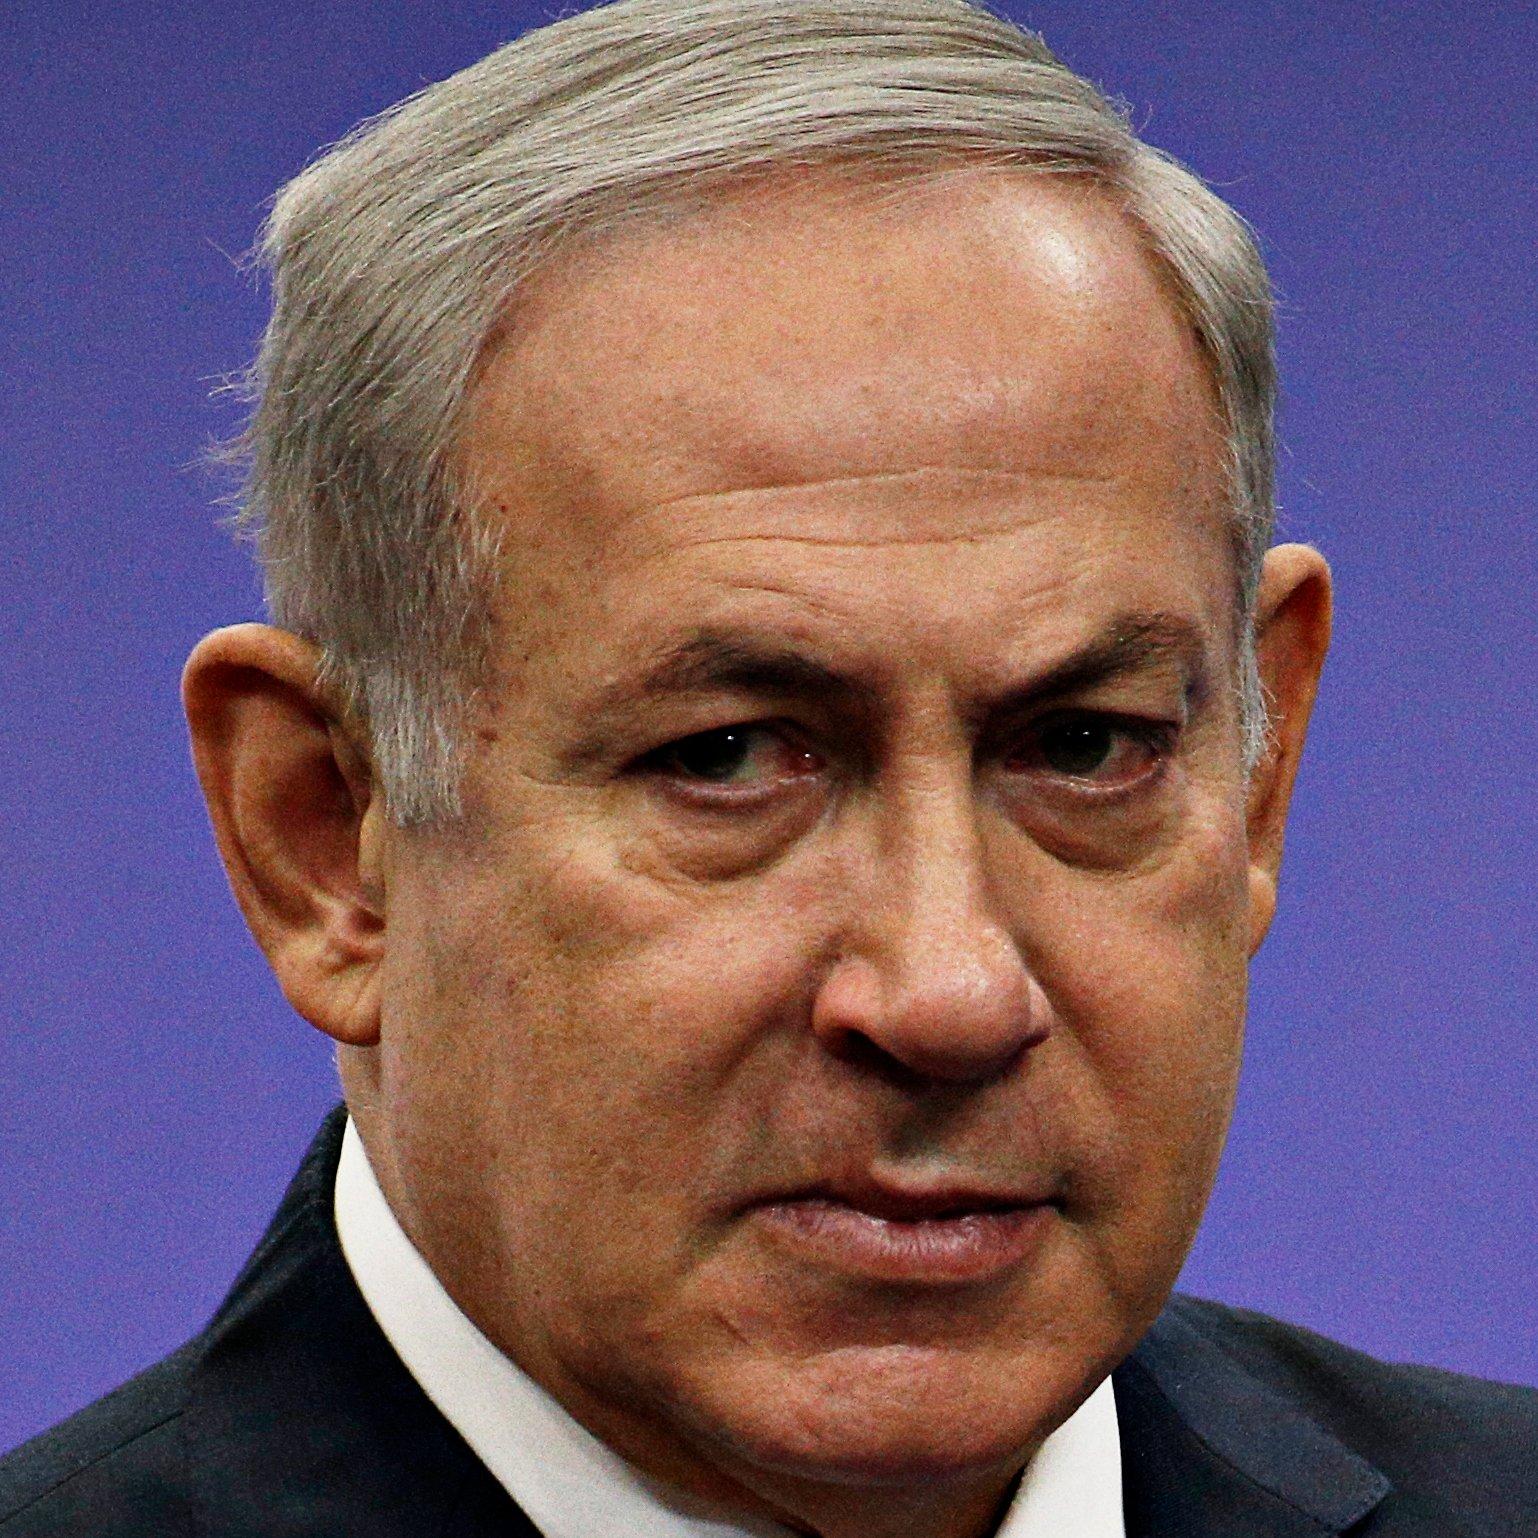 Listen: Netanyahu Faces Final Curtain - cover